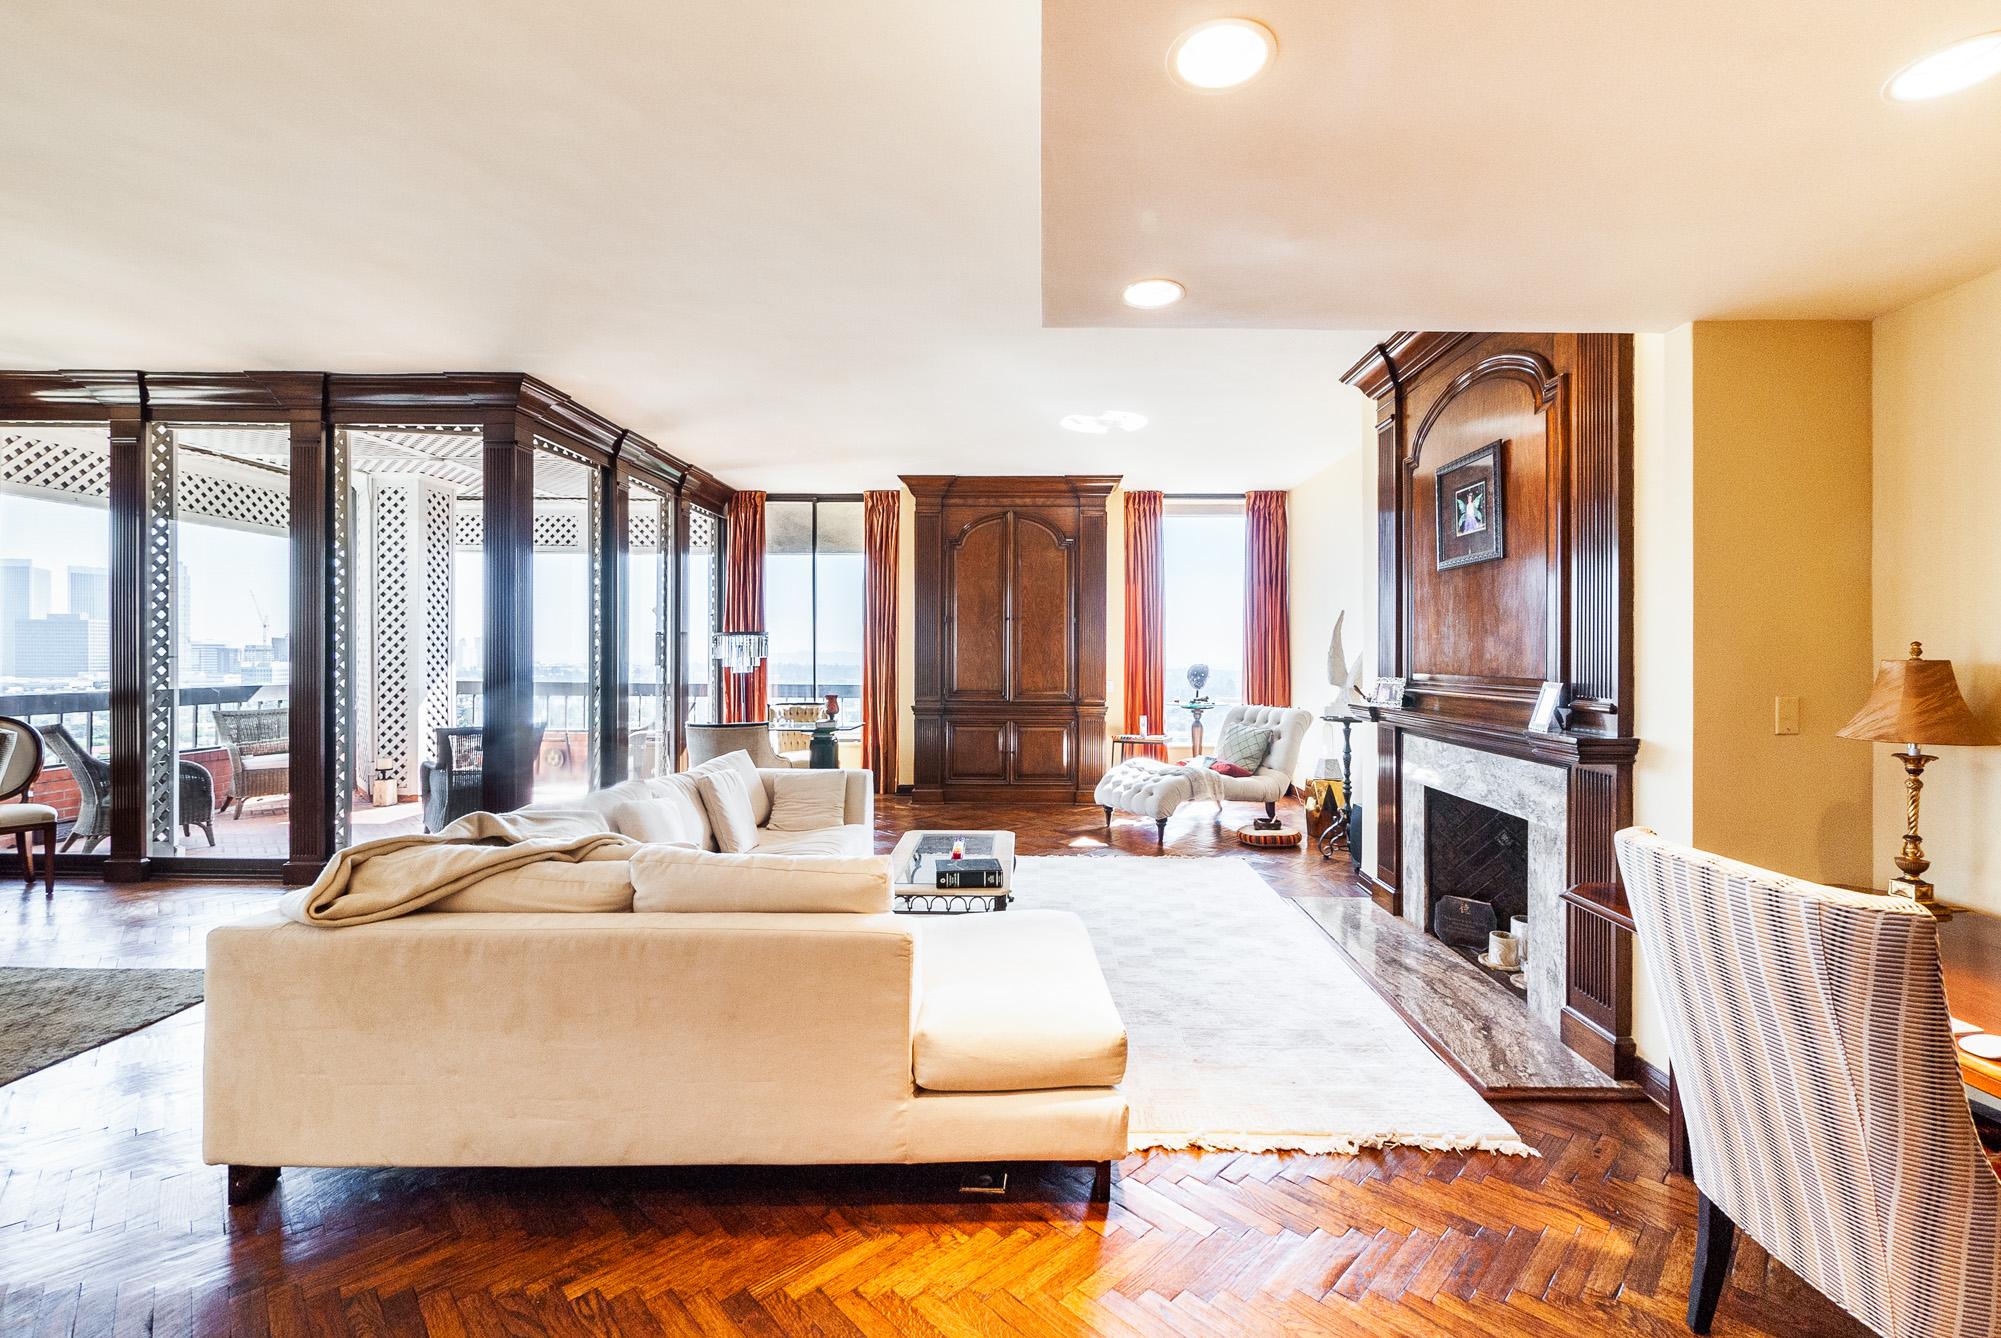 Penthouse Luxury in Prestigious Wilshire Corridor - Westwood!